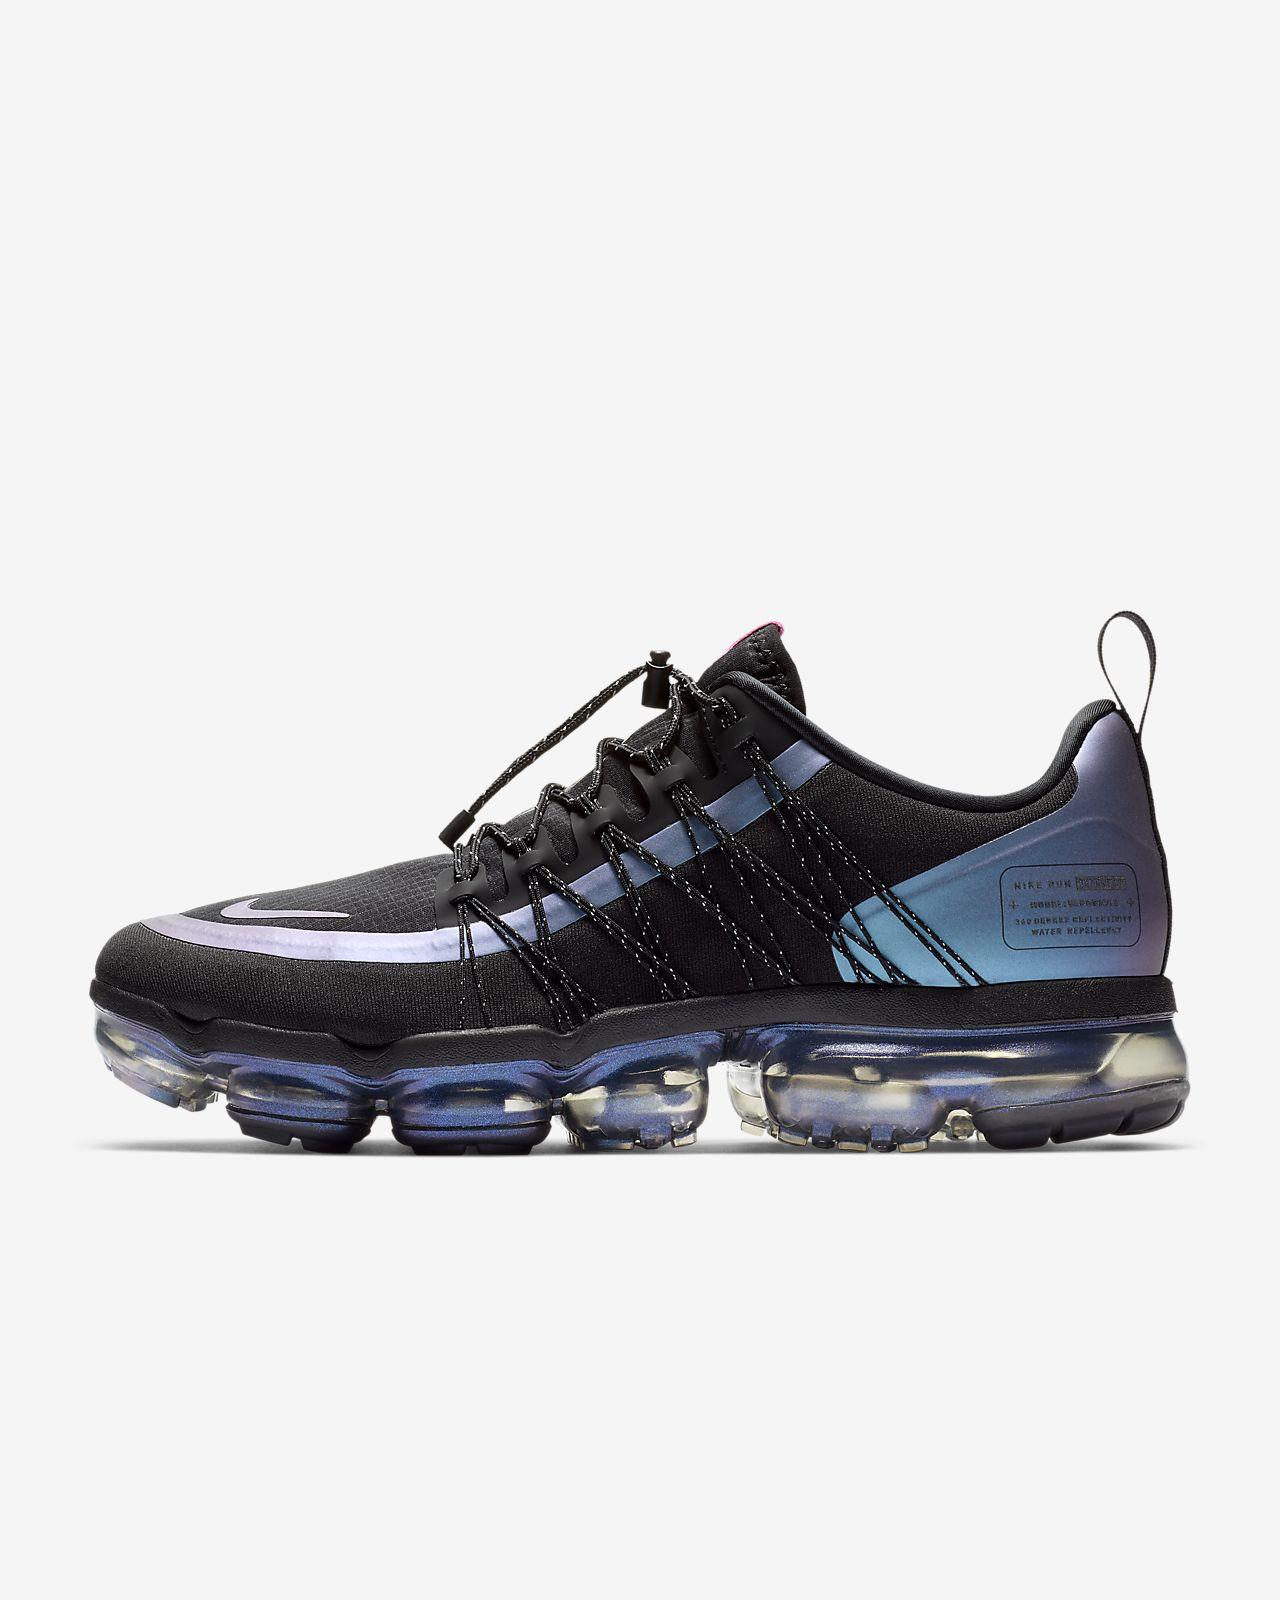 outlet store 141b7 518a3 ... Scarpa Nike Air VaporMax Utility - Uomo